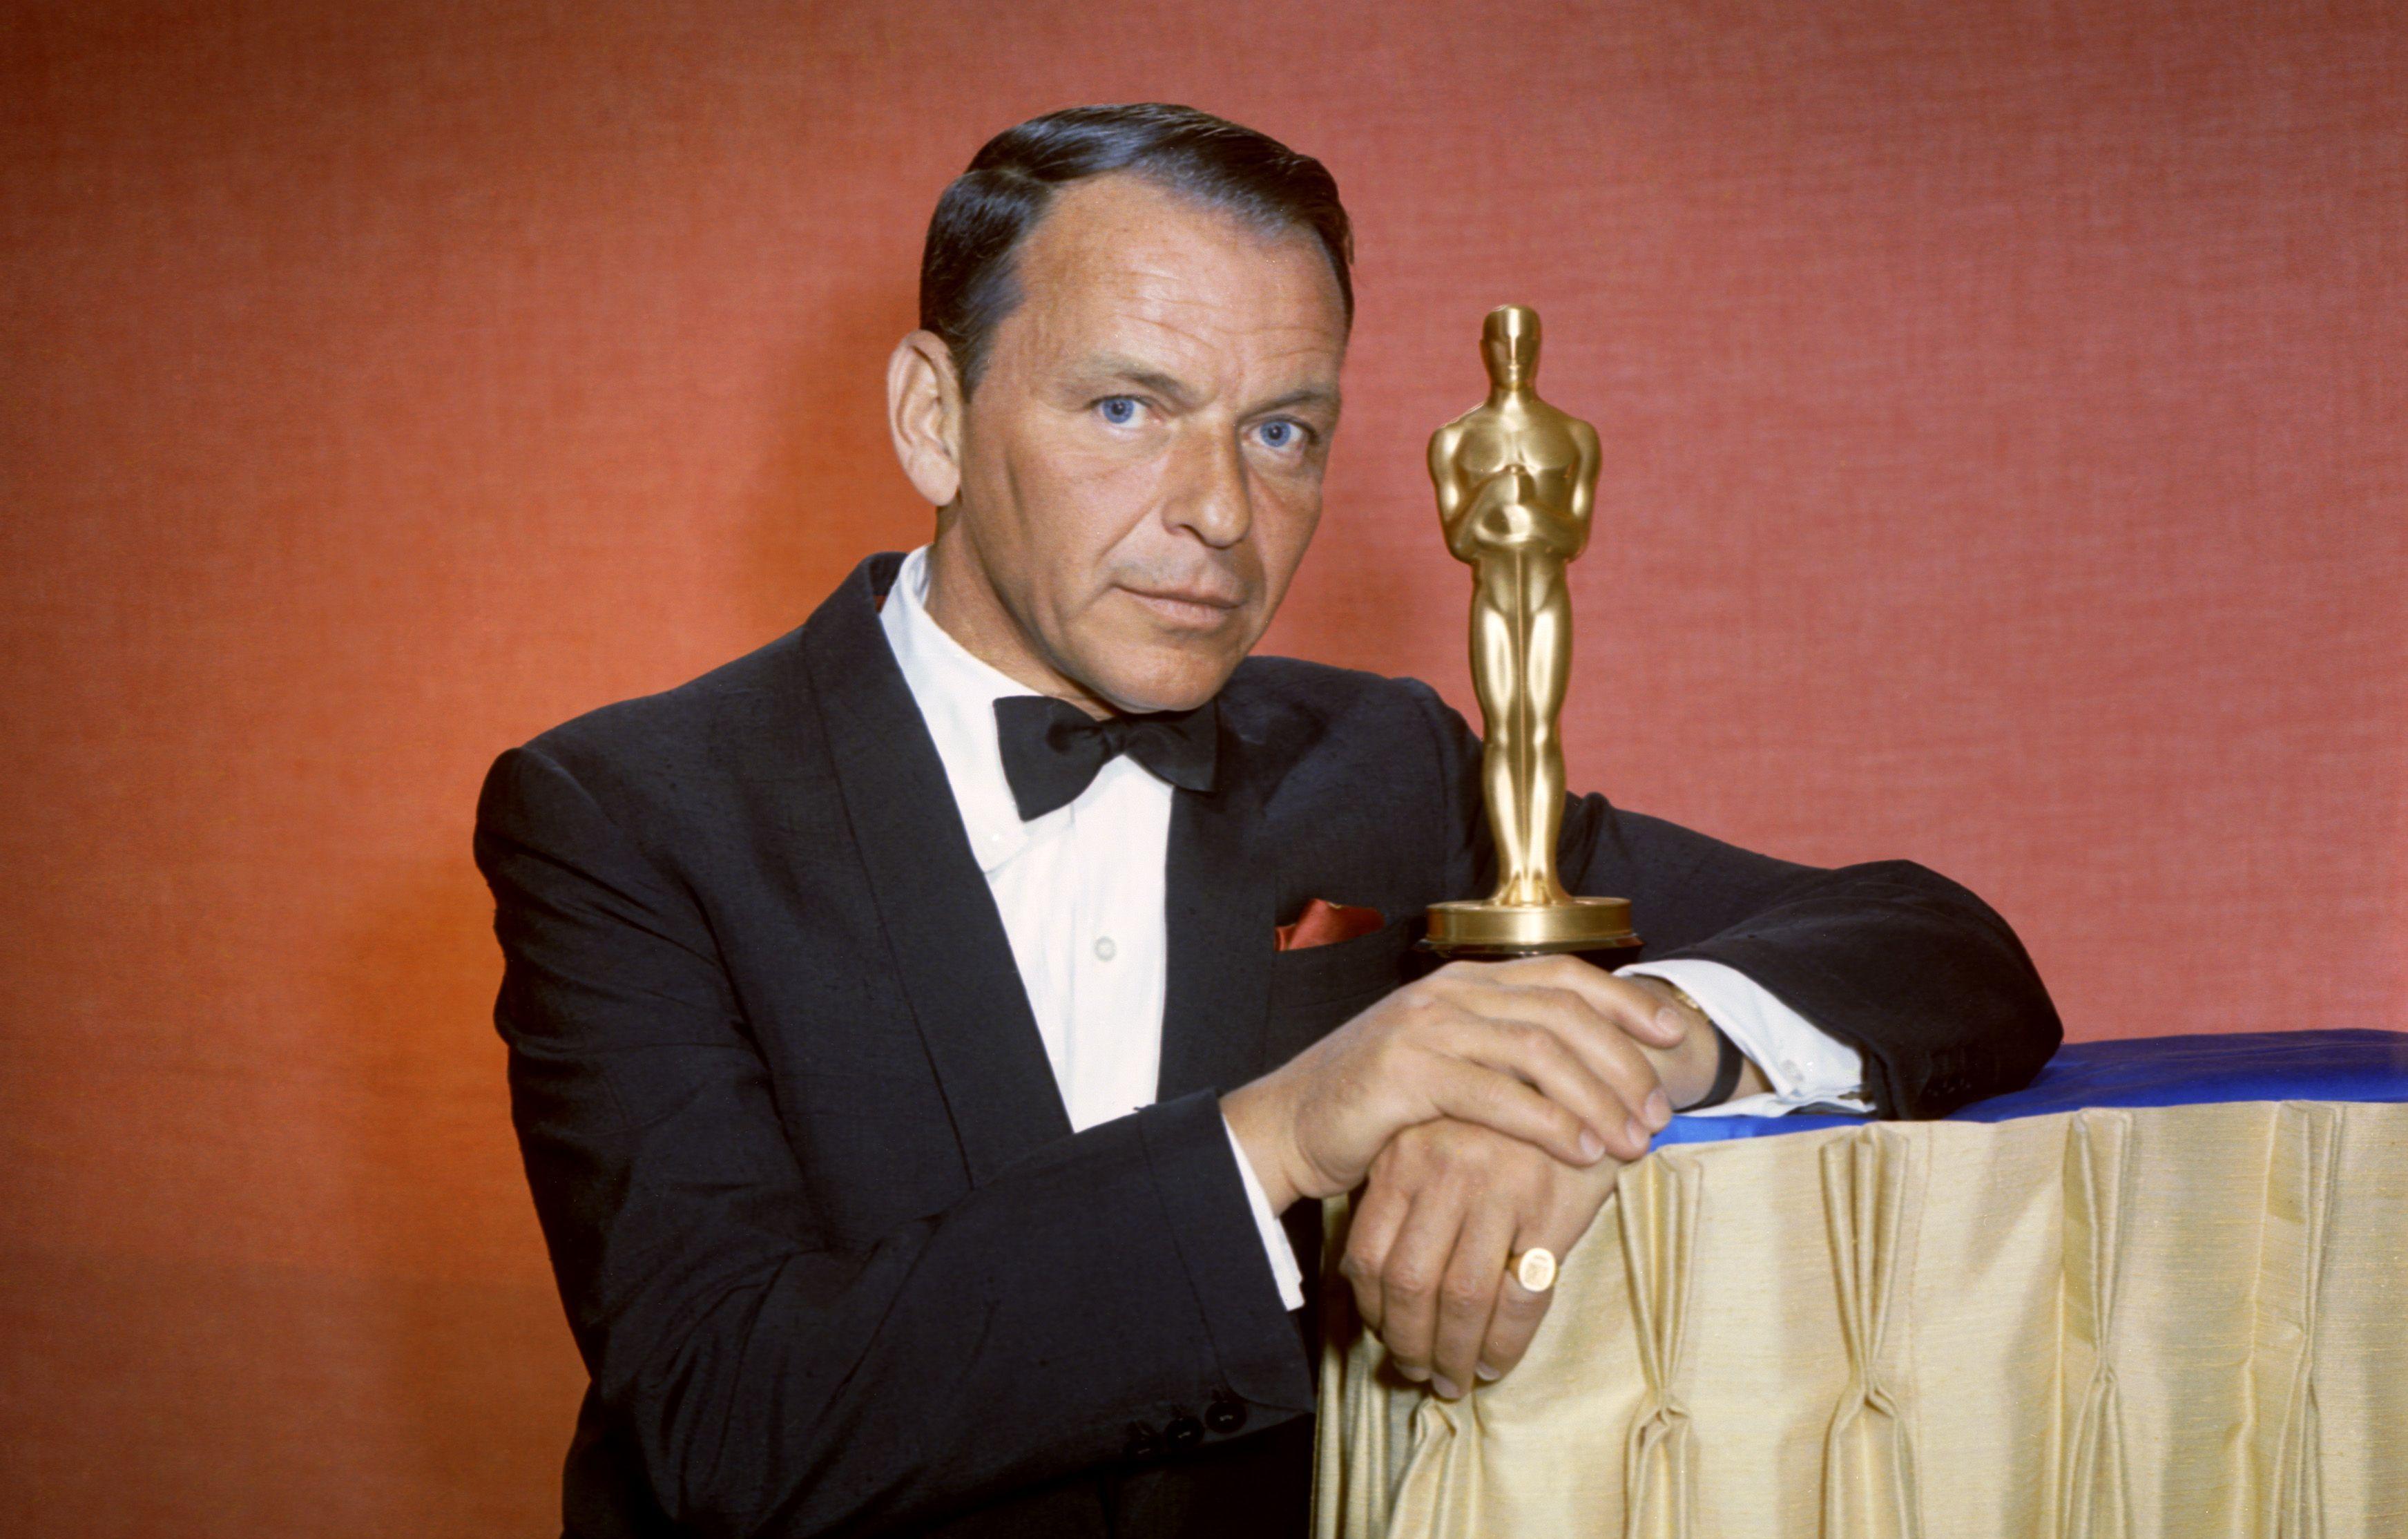 Il premio Oscar Frank Sinatra